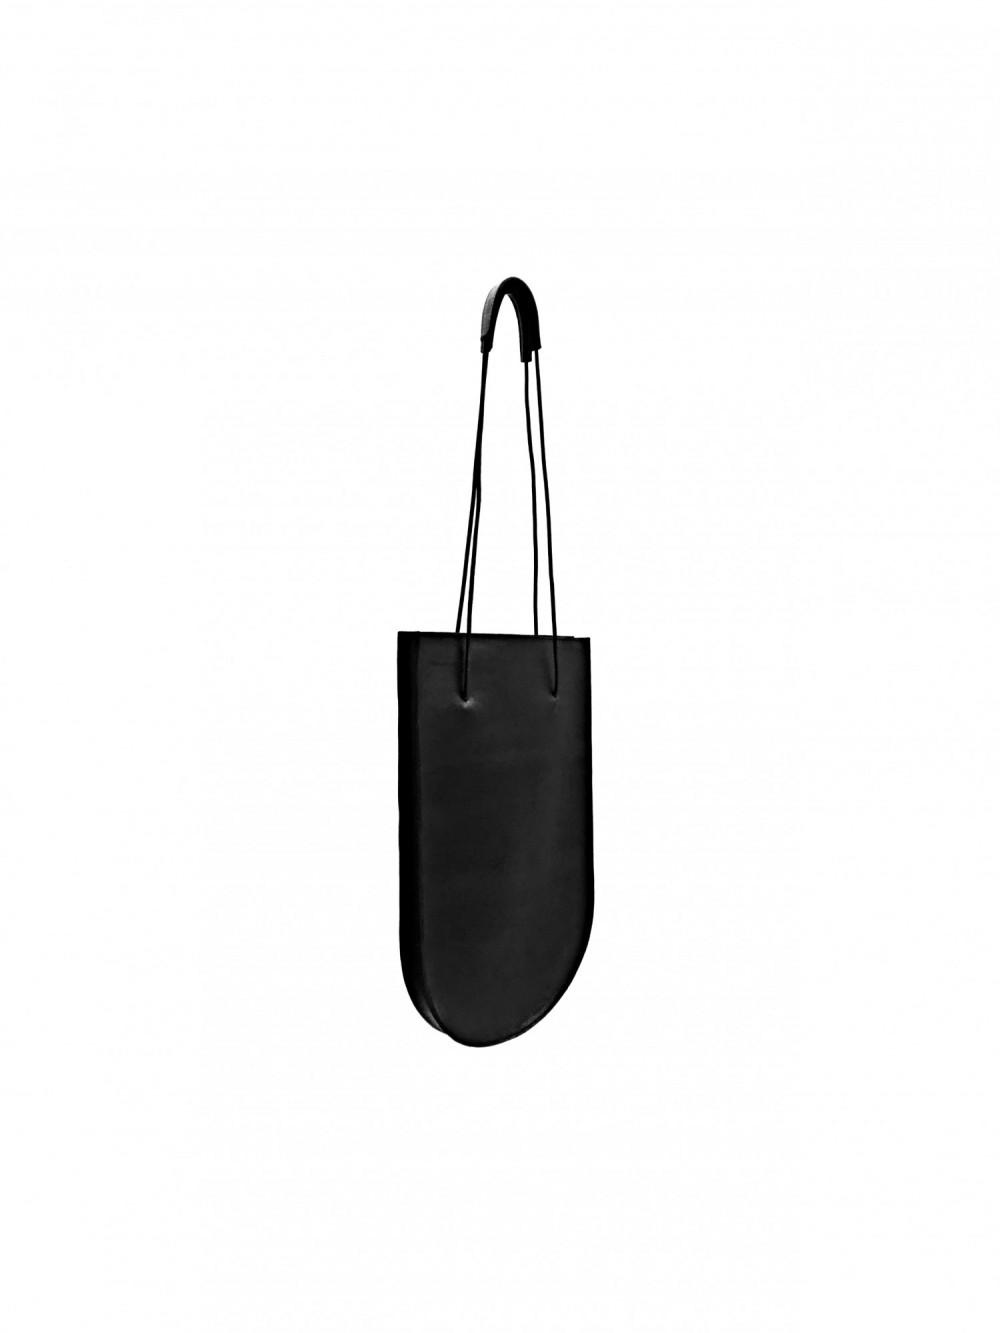 U - bag black